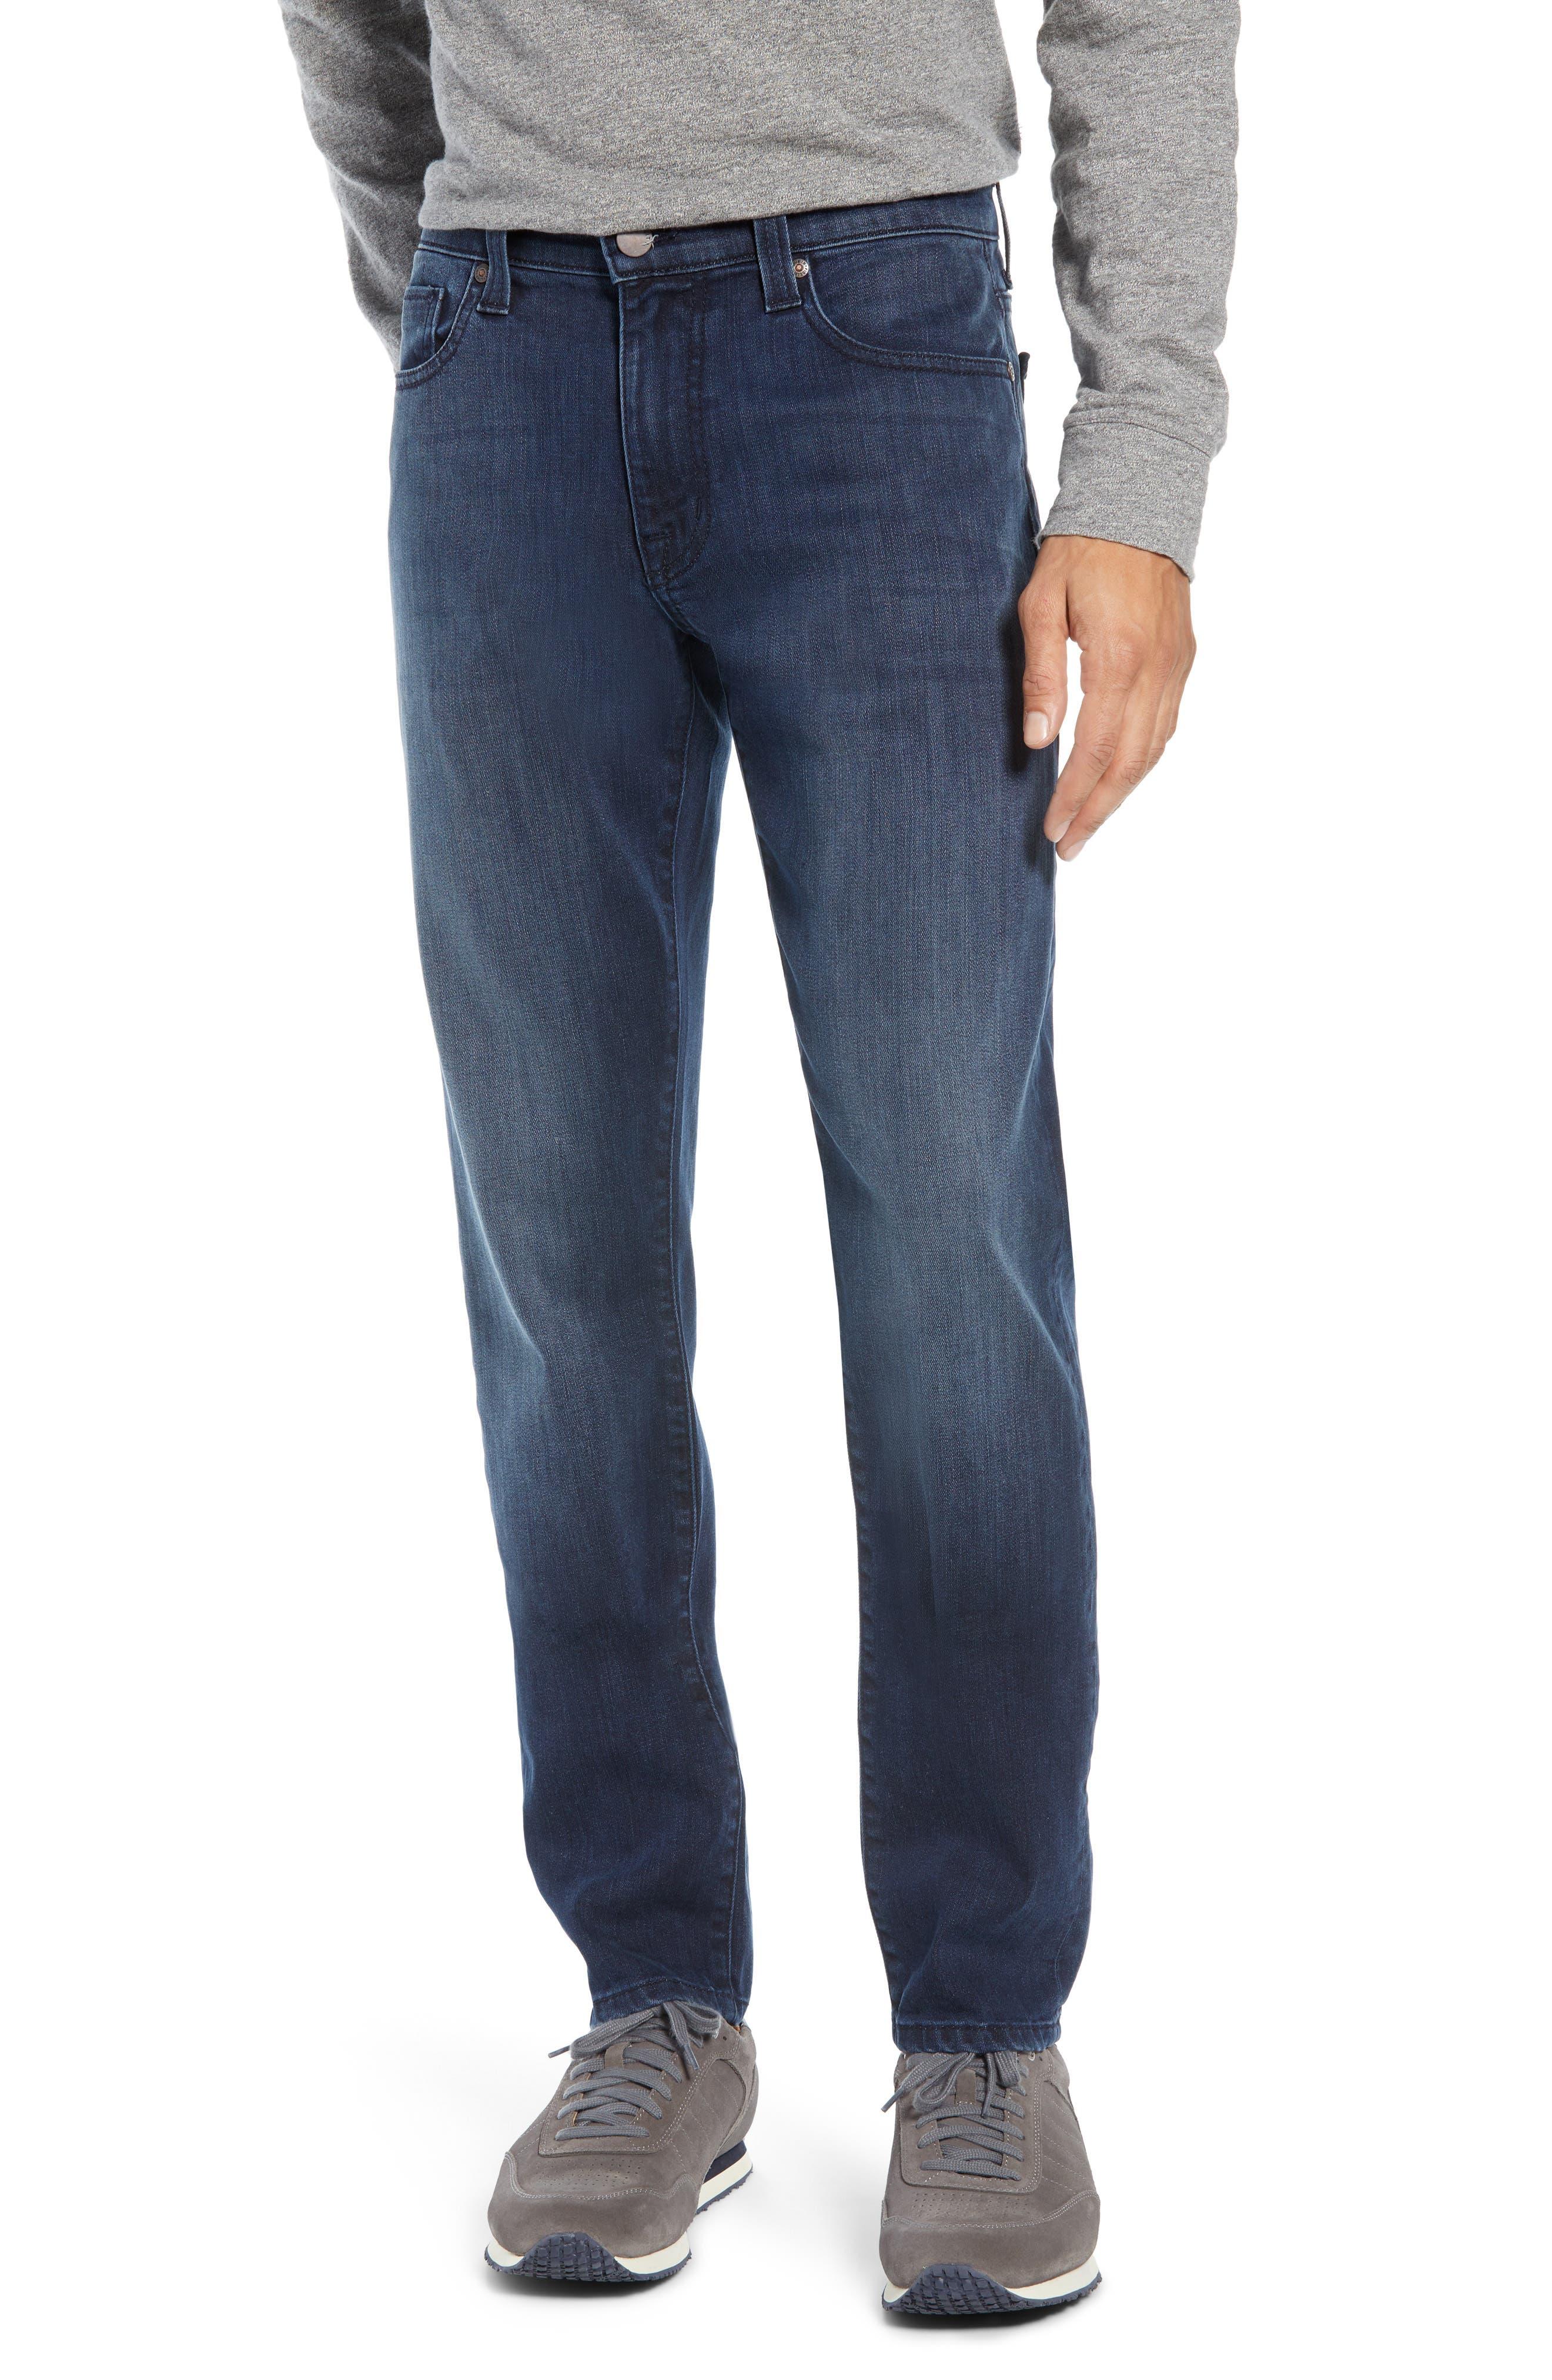 FIDELITY DENIM Torino Slim Fit Jeans, Main, color, SPECTRE